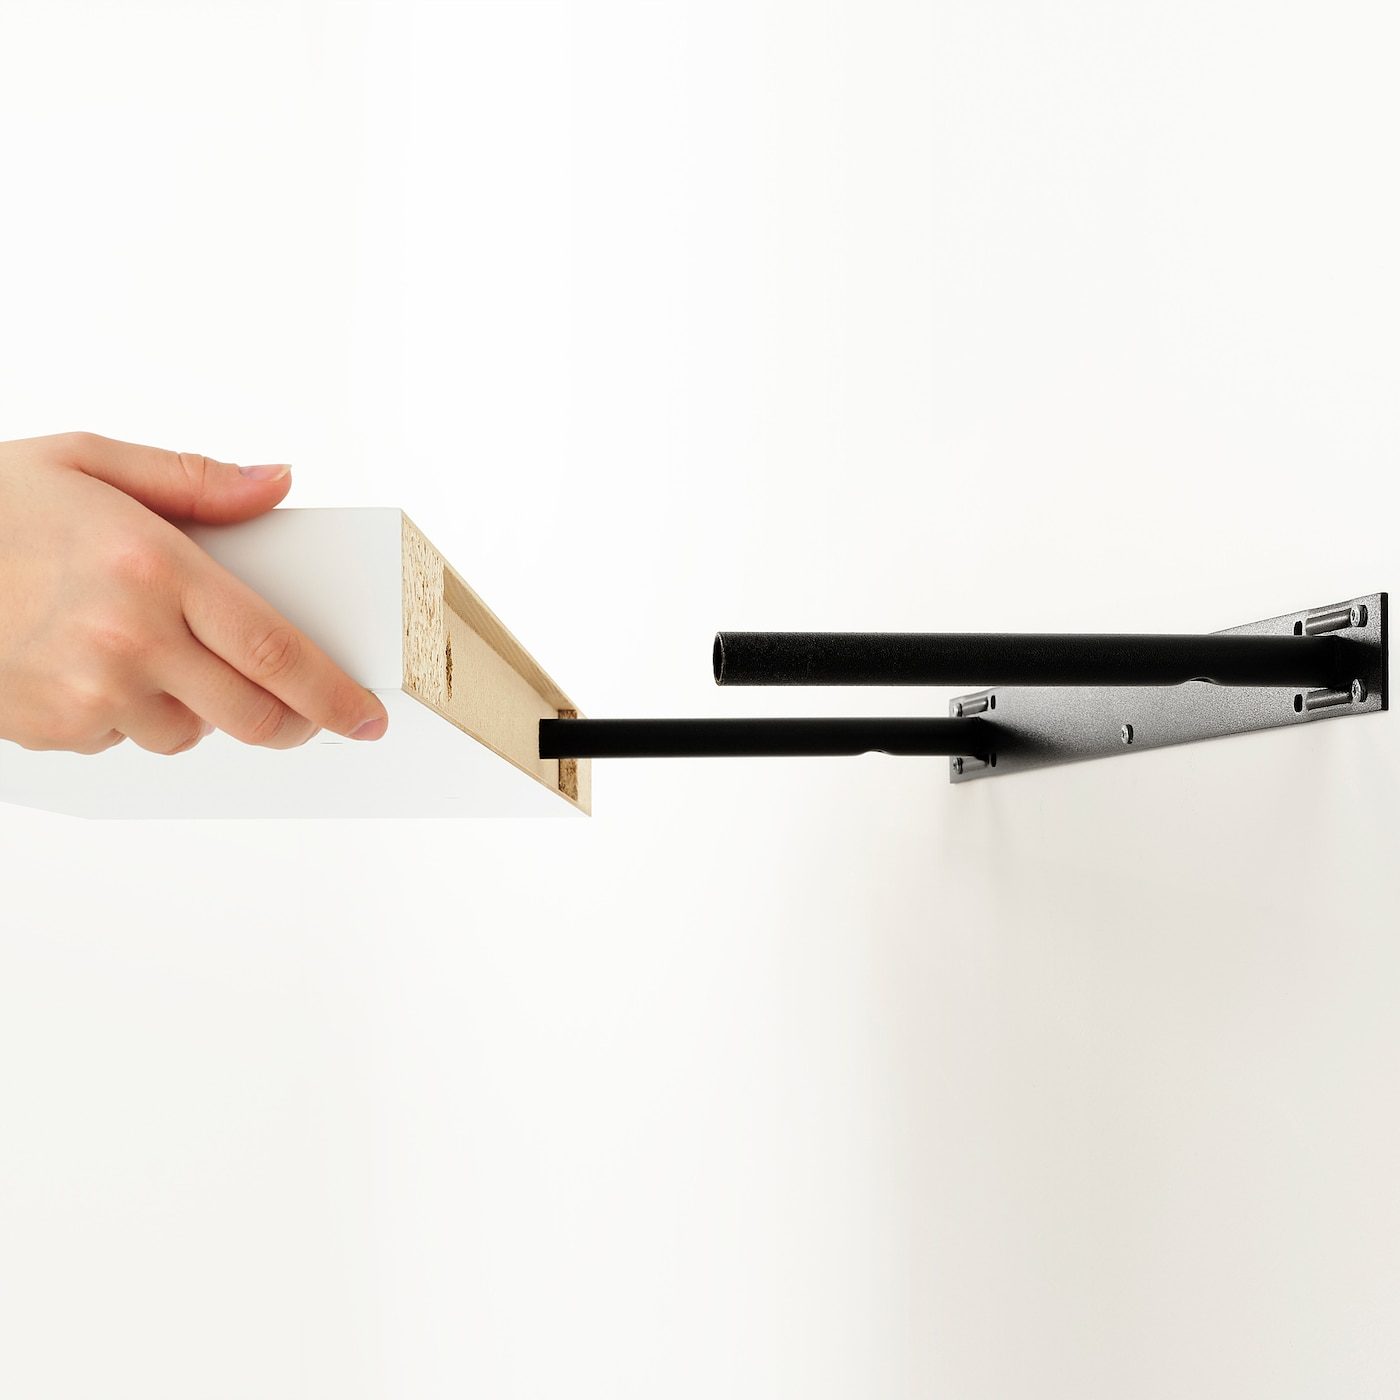 Lack Wandregal Weiss Ikea Deutschland